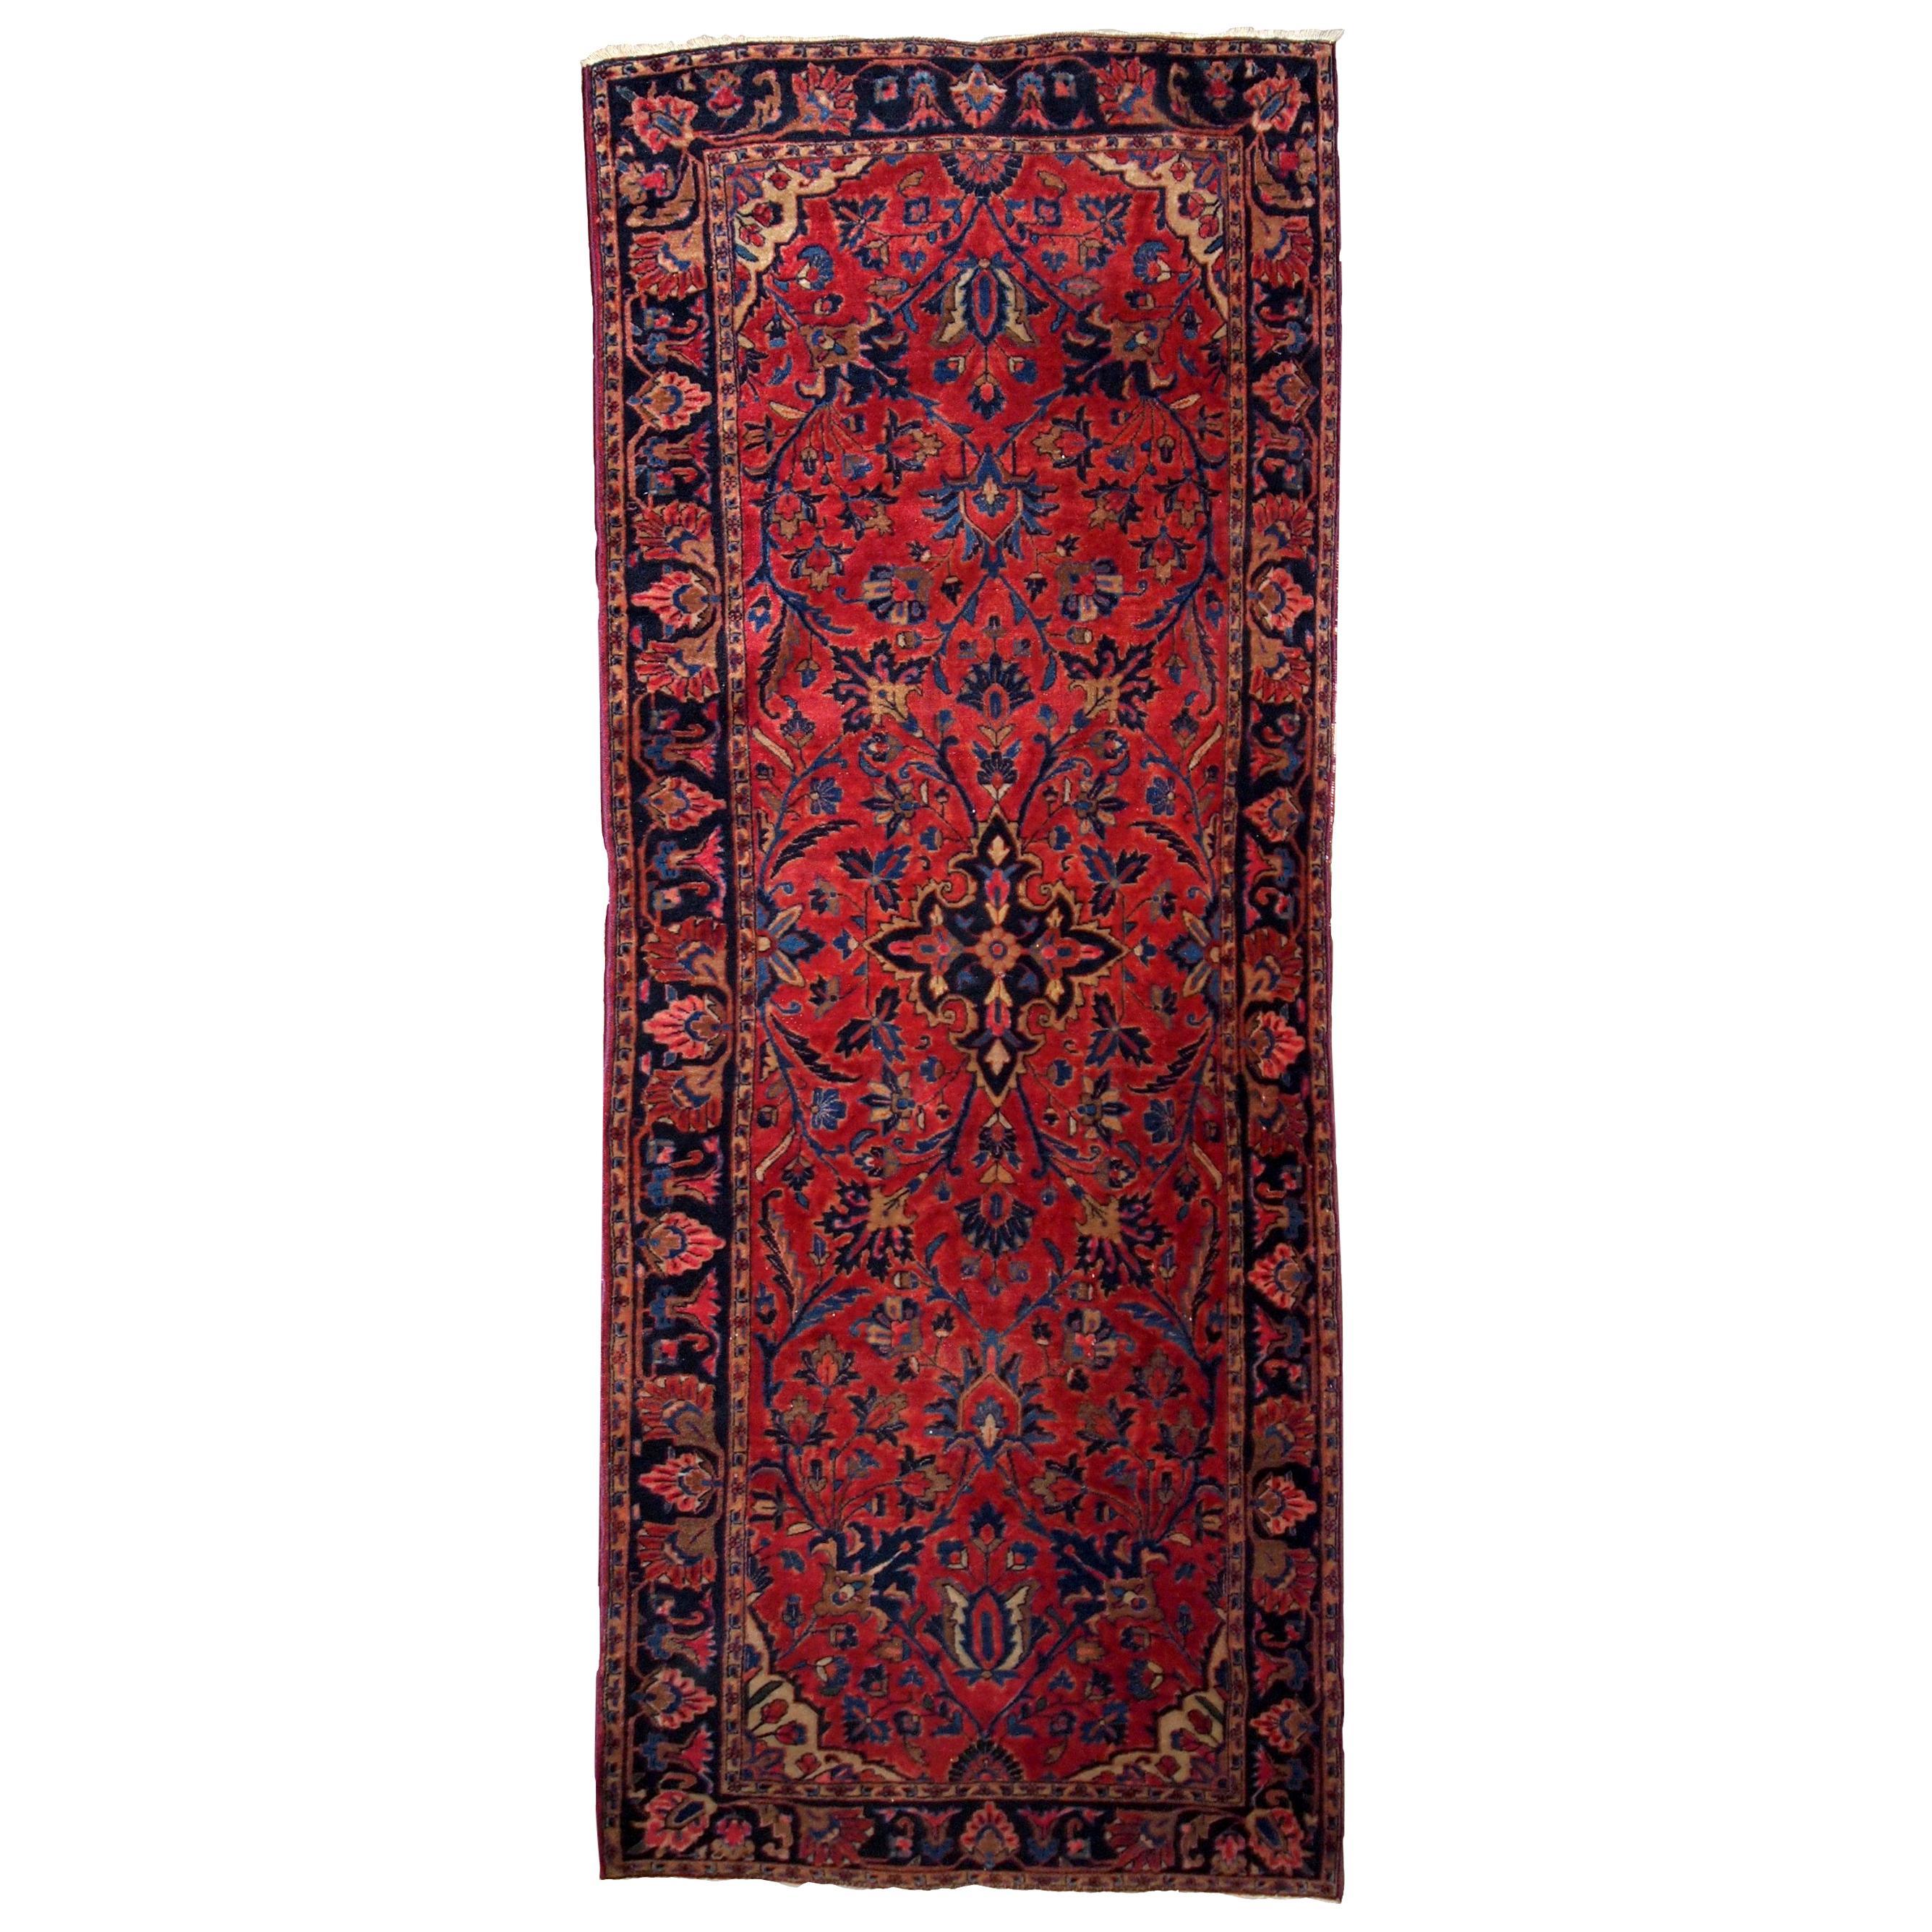 Handmade Antique Kashan Style Rug, 1900s, 1B803